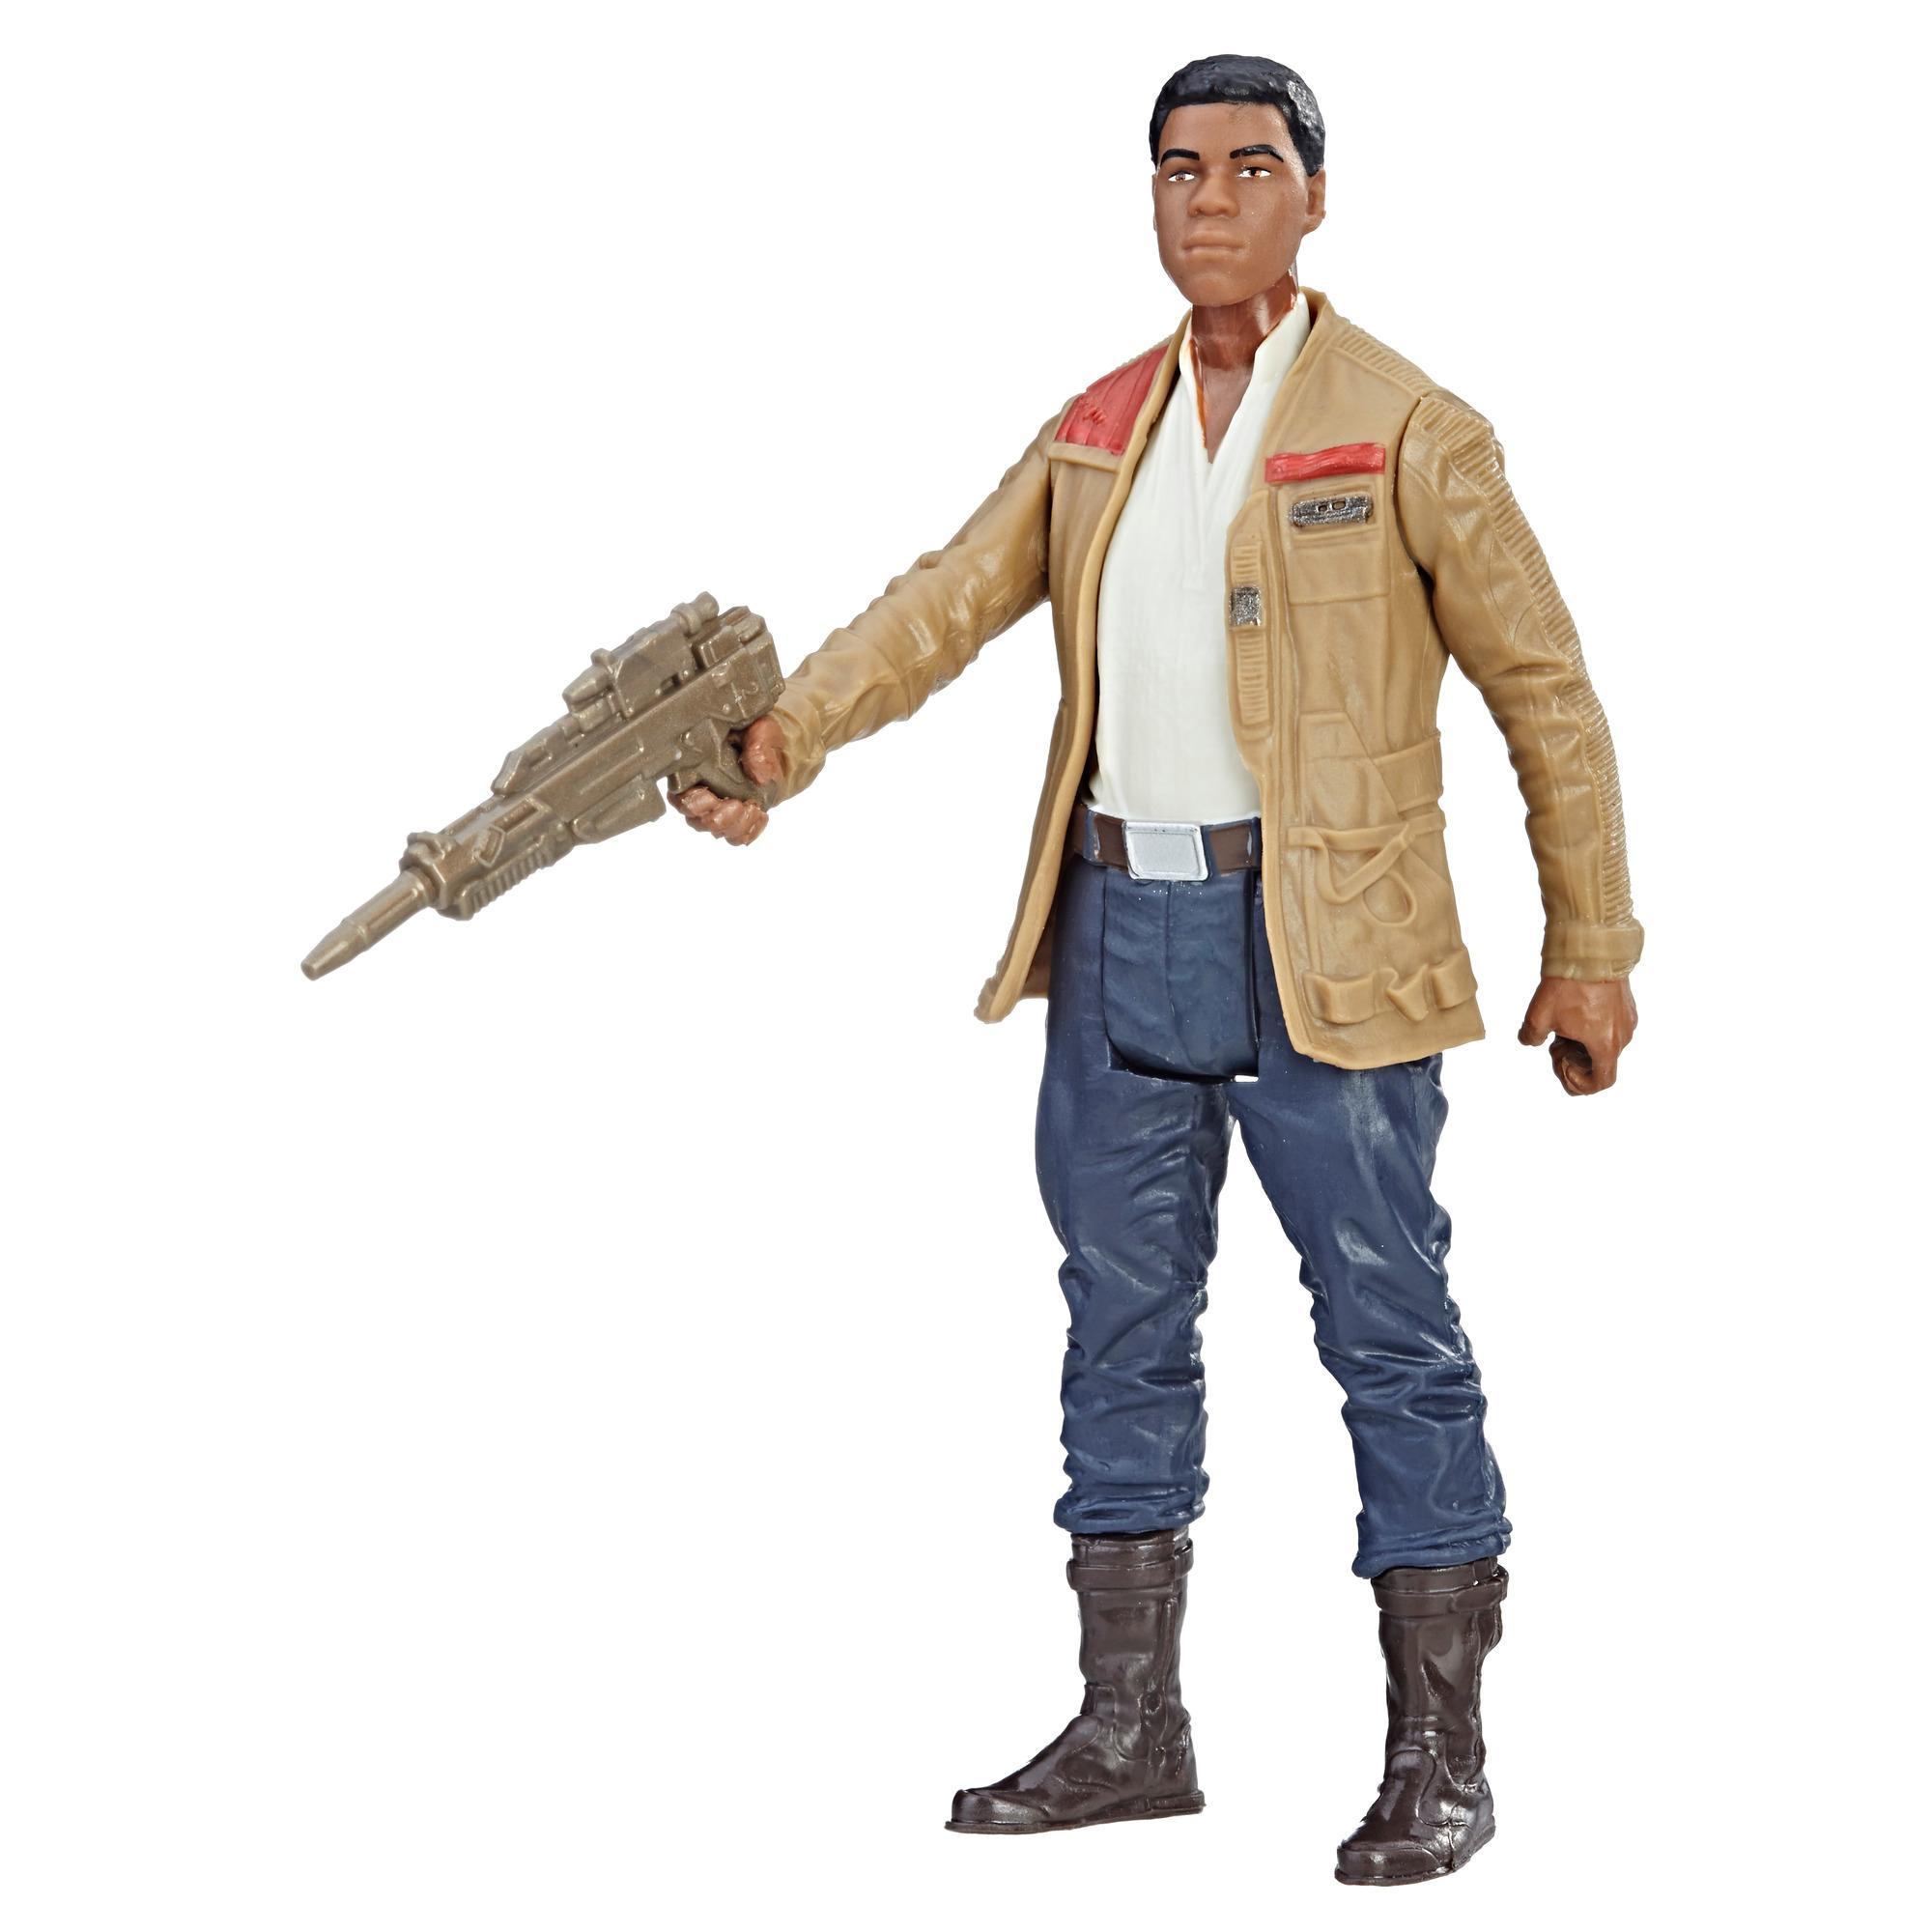 Star Wars Finn (Resistance Fighter) Force Link Figure